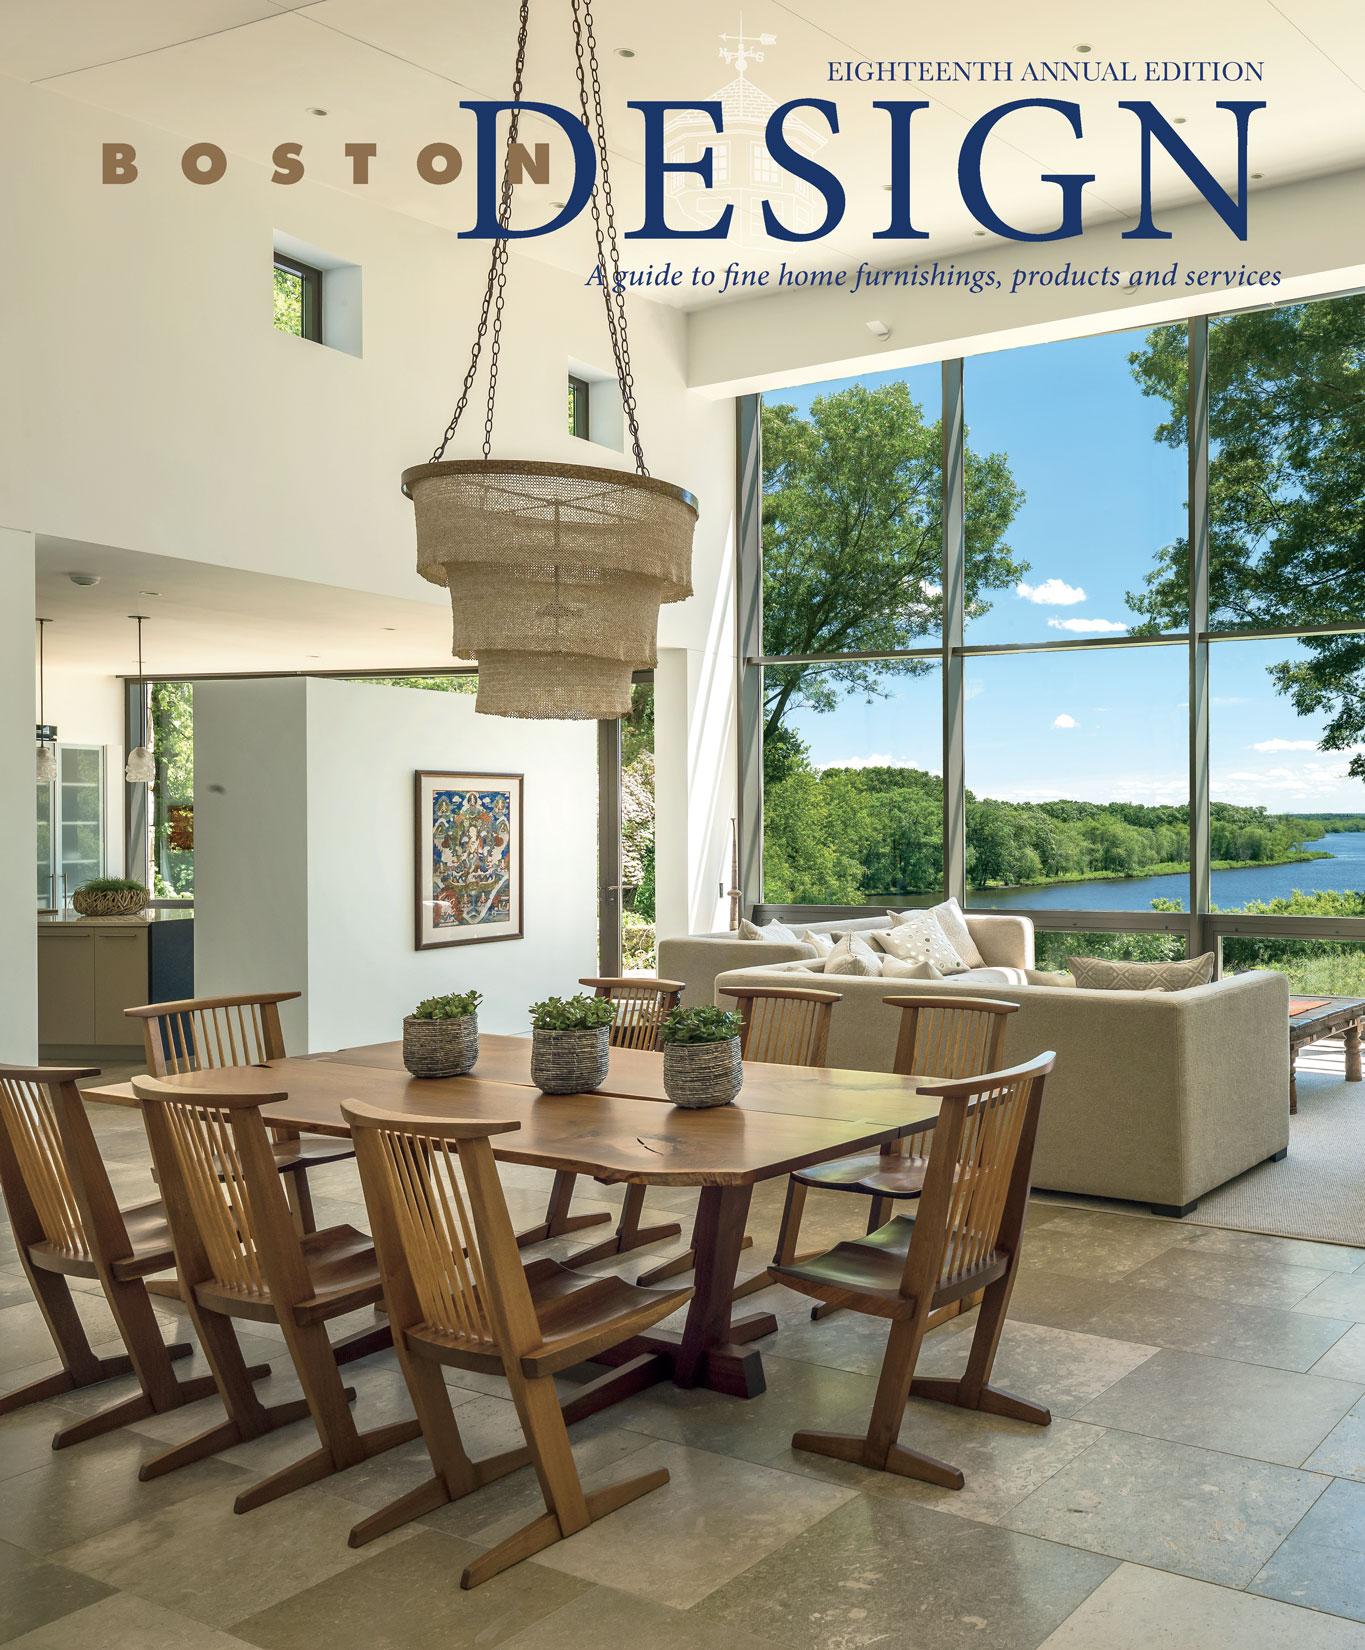 Boston Design Guide 18th Edition Merz Construction Pisani Associates Architects